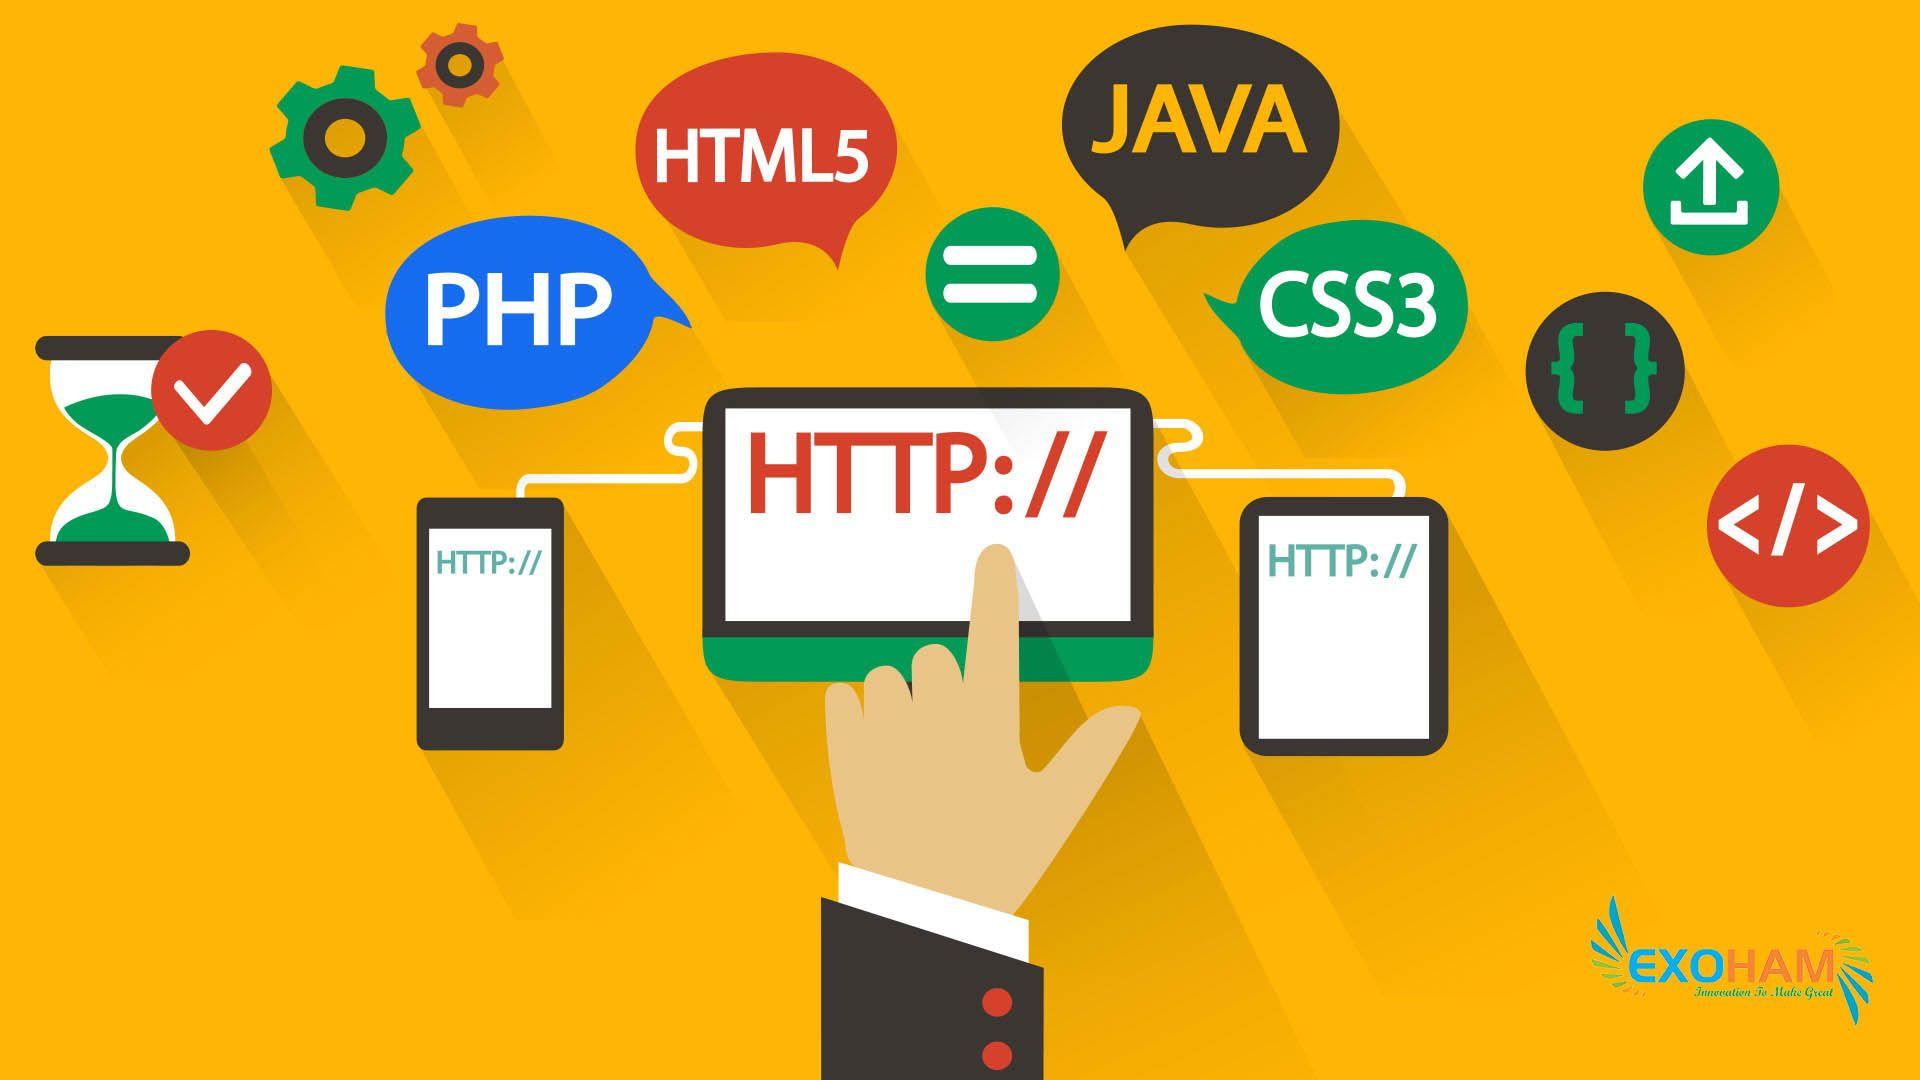 Pin By Exoham Technologies On Web Development Pune Web Development Web Design Training Web Development Company